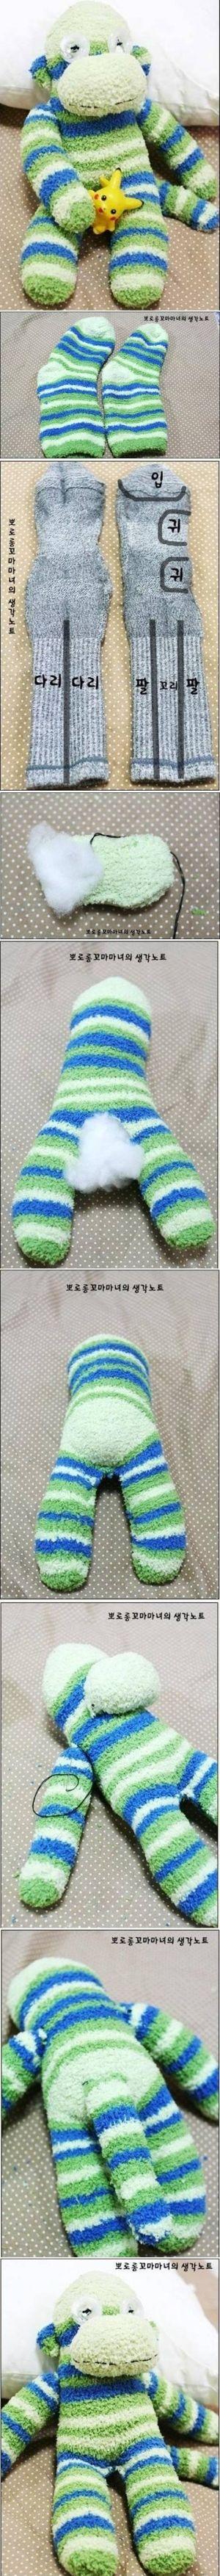 DIY Sock Monkey Terry DIY Sock Monkey Terry by diyforever